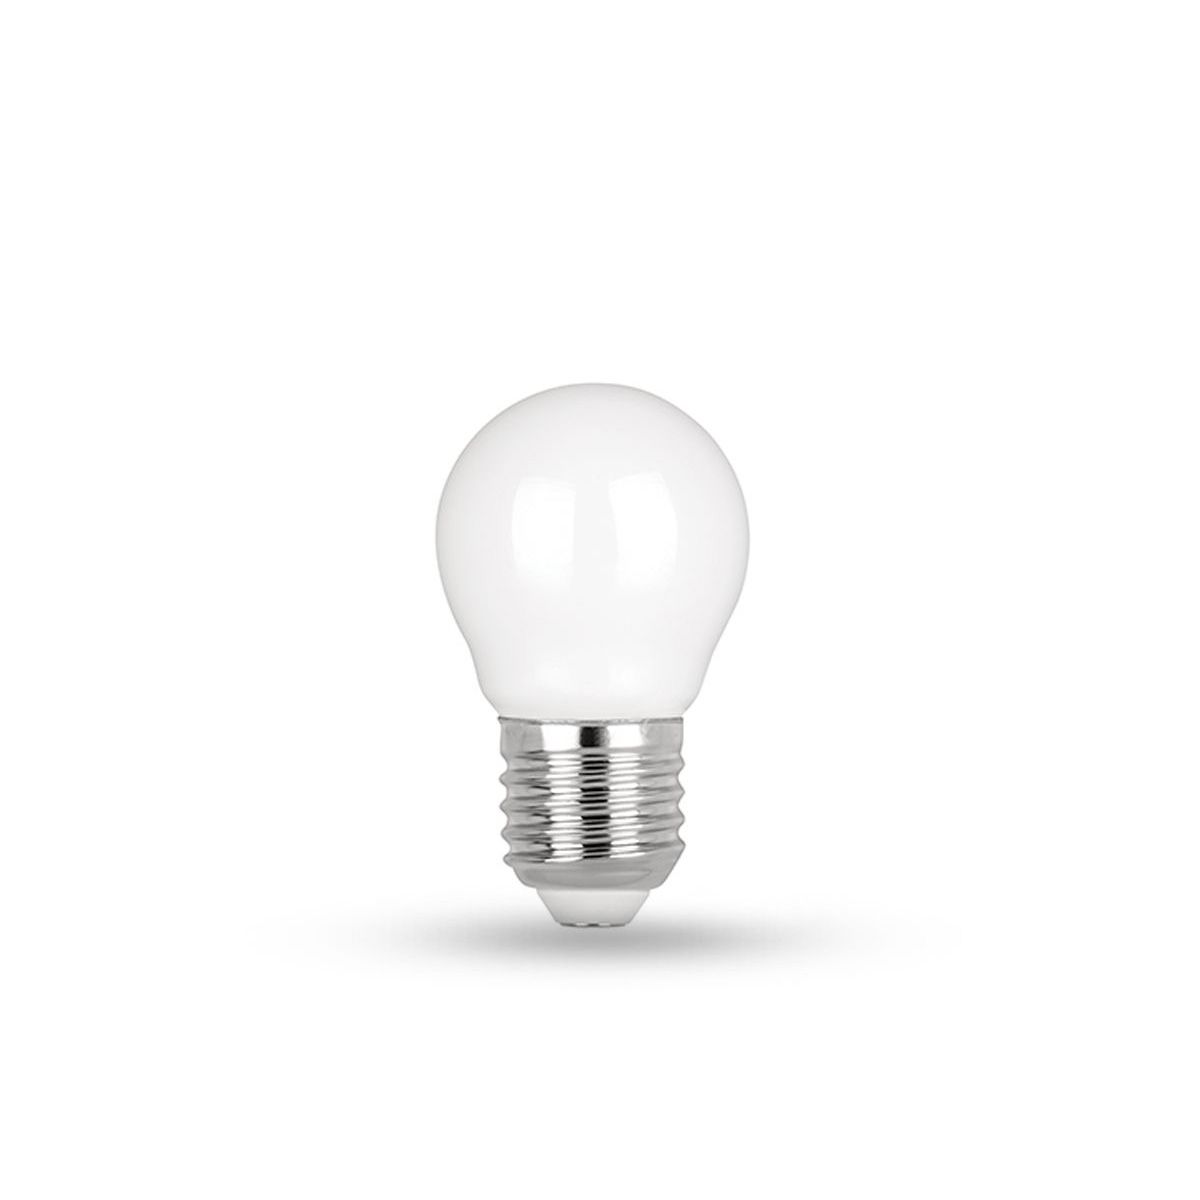 Lâmpada LED Mini Bulbo Filamento Milky 2W 2700K STH8220/27 - Stella